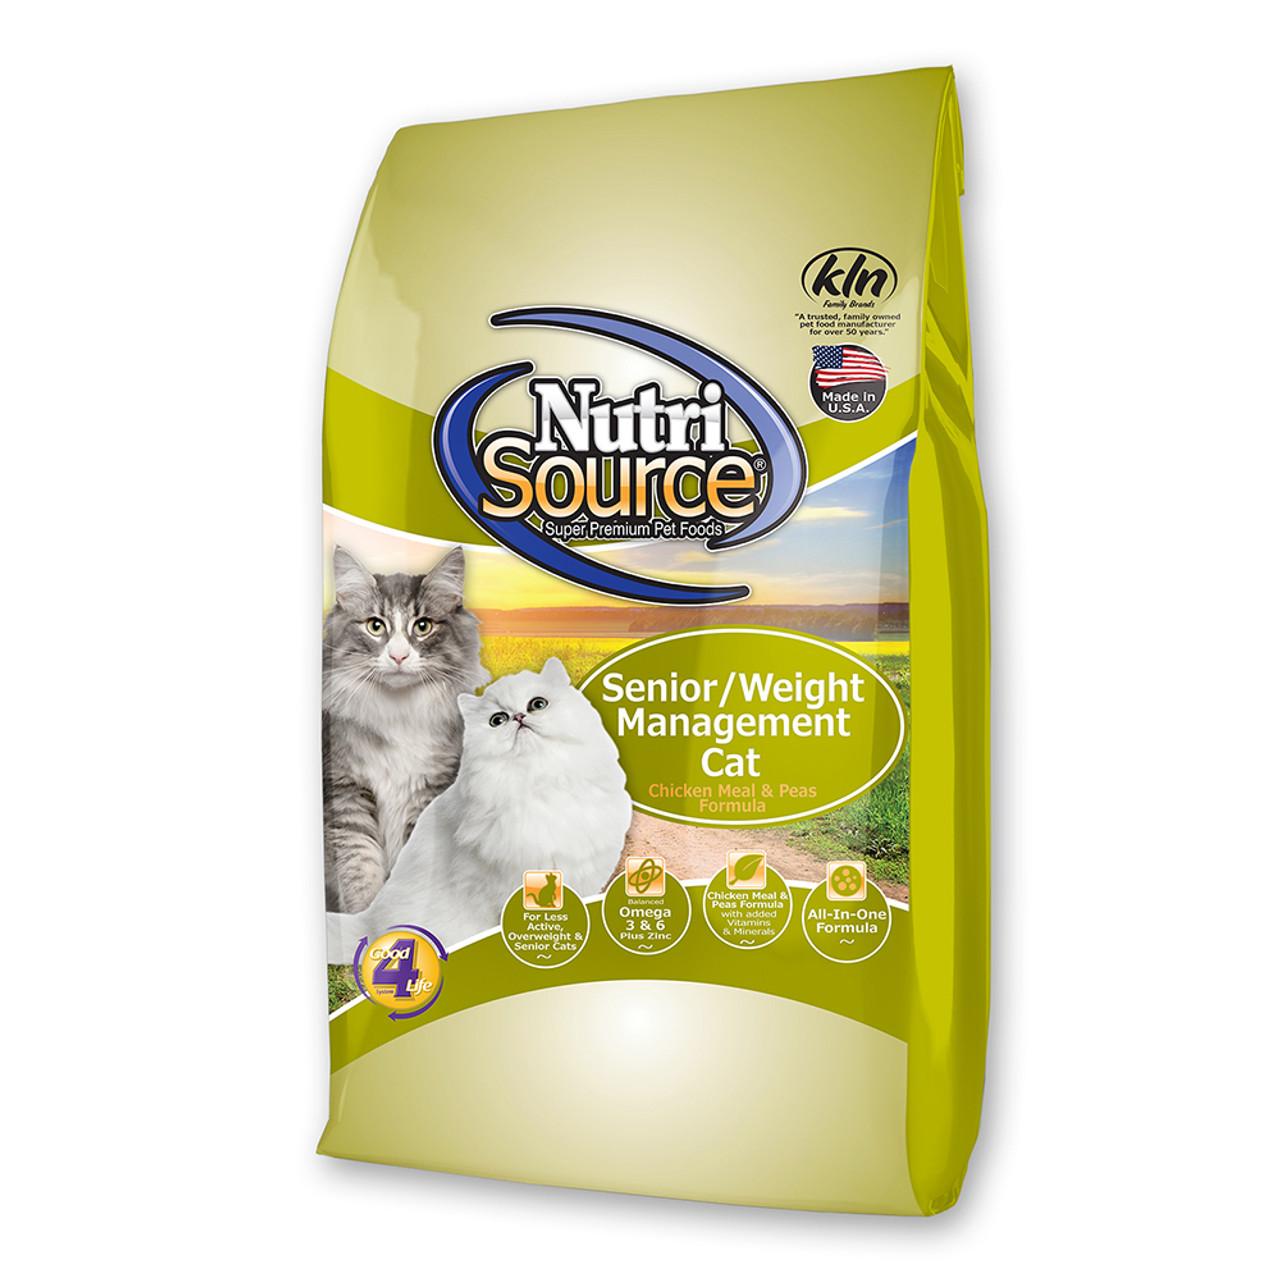 NutriSource Senior / Weight Management Dry Cat Food